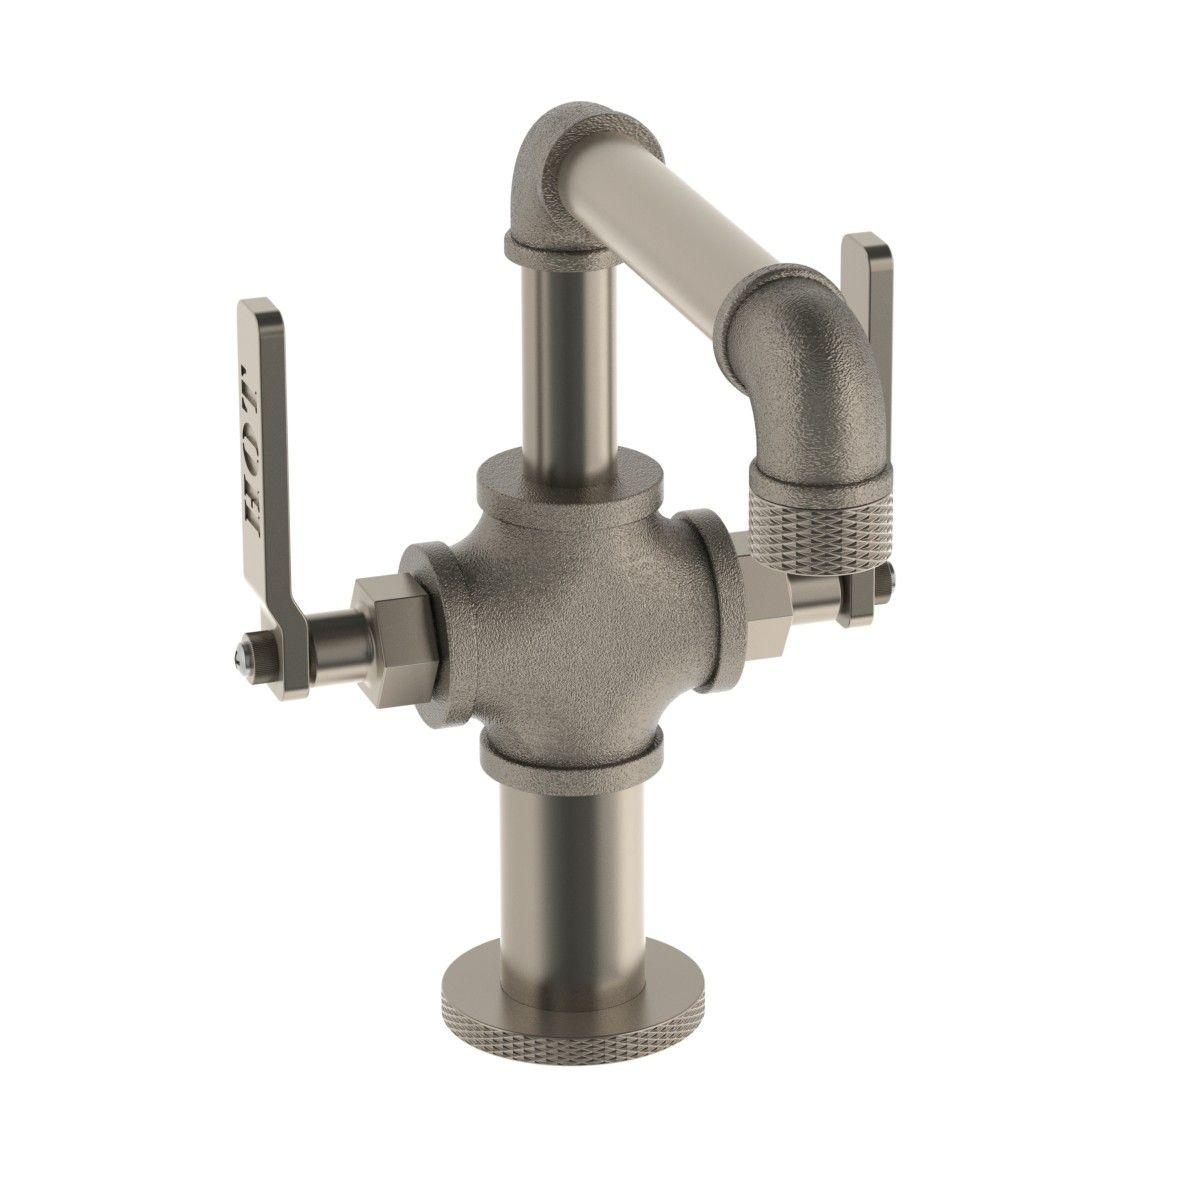 Elan Vital 38 Single Hole Lavatory Faucet | Lavatory faucet, Faucet ...